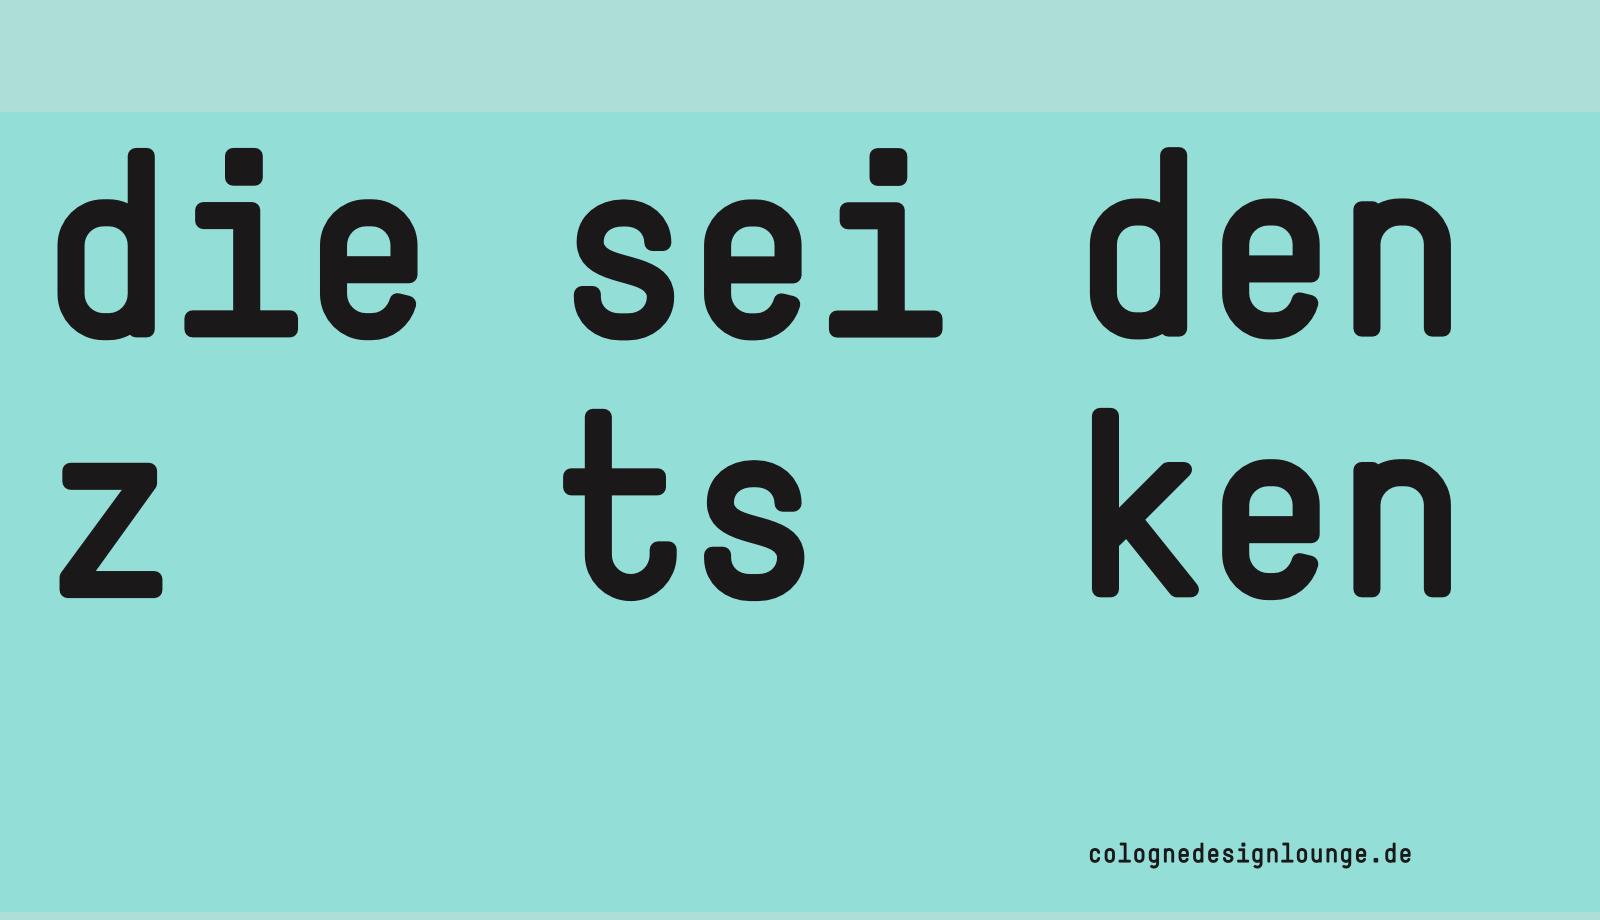 170511_Designkritik_ReneSpitz_StefanDiez-CologneDesignLounge-MAKK.001